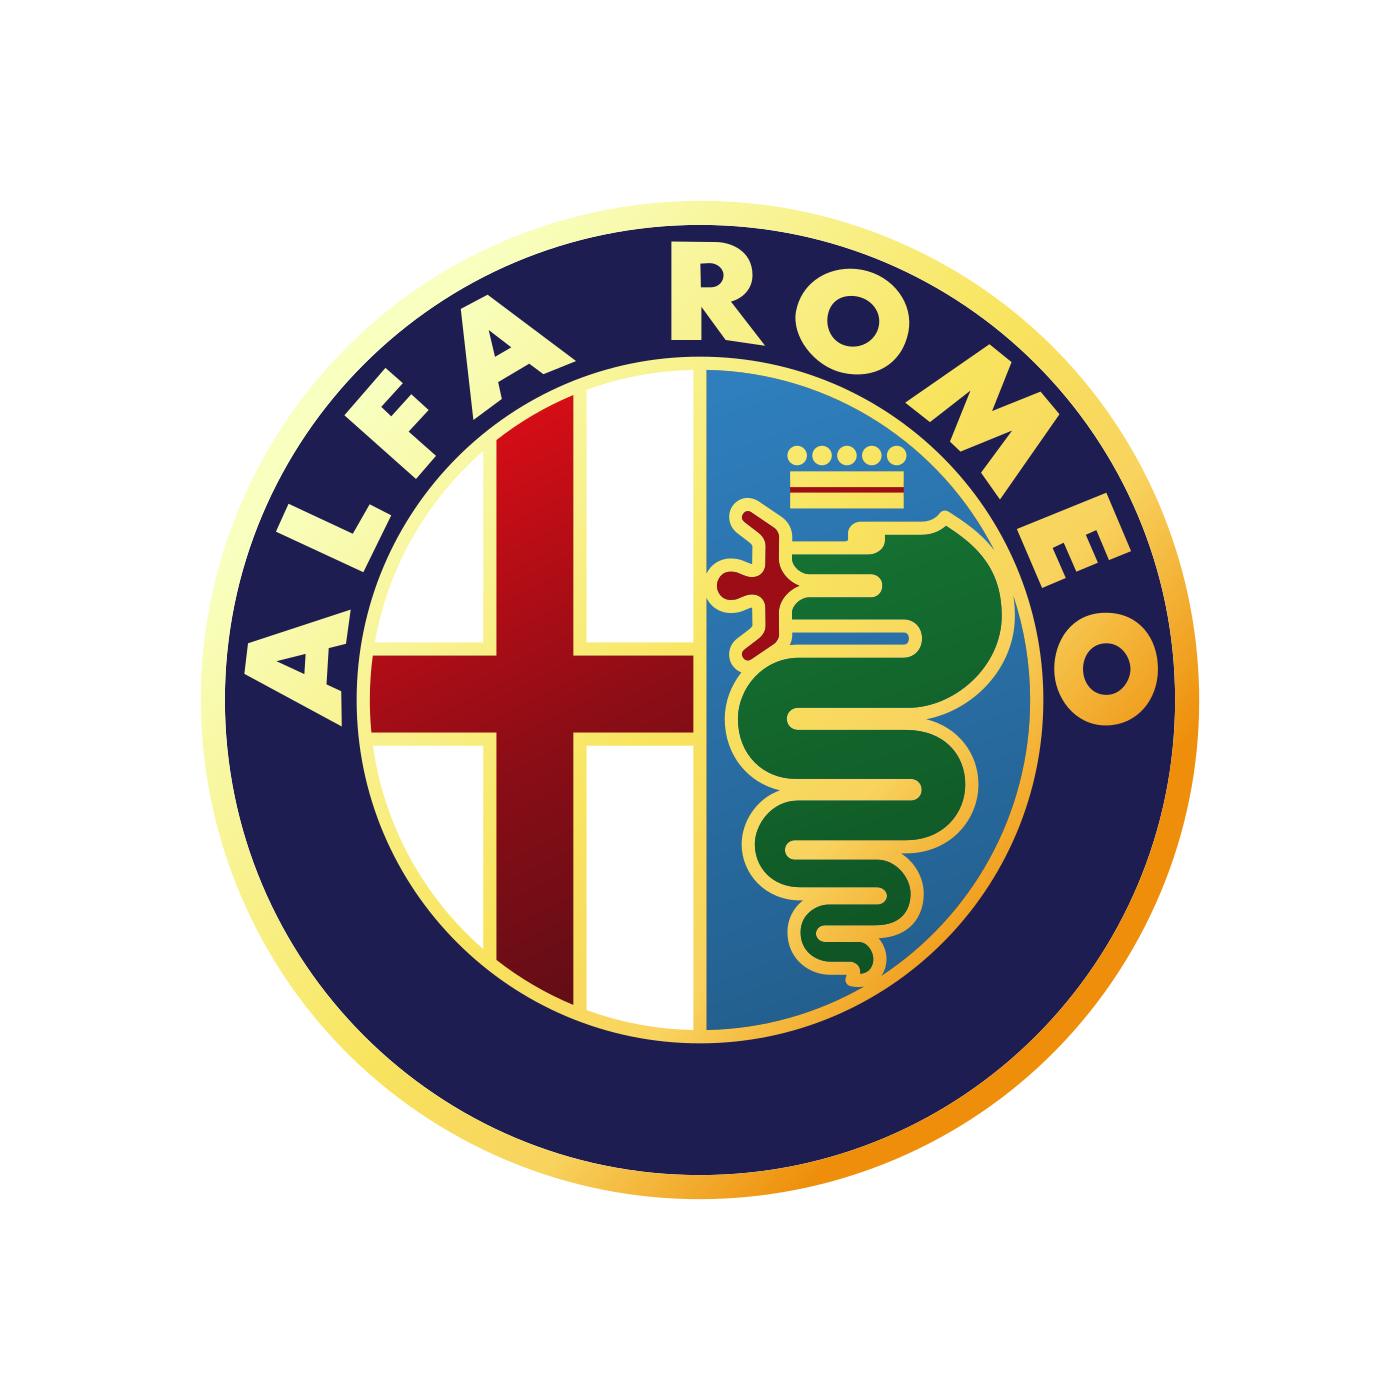 AlfaRomeo-klein.jpg